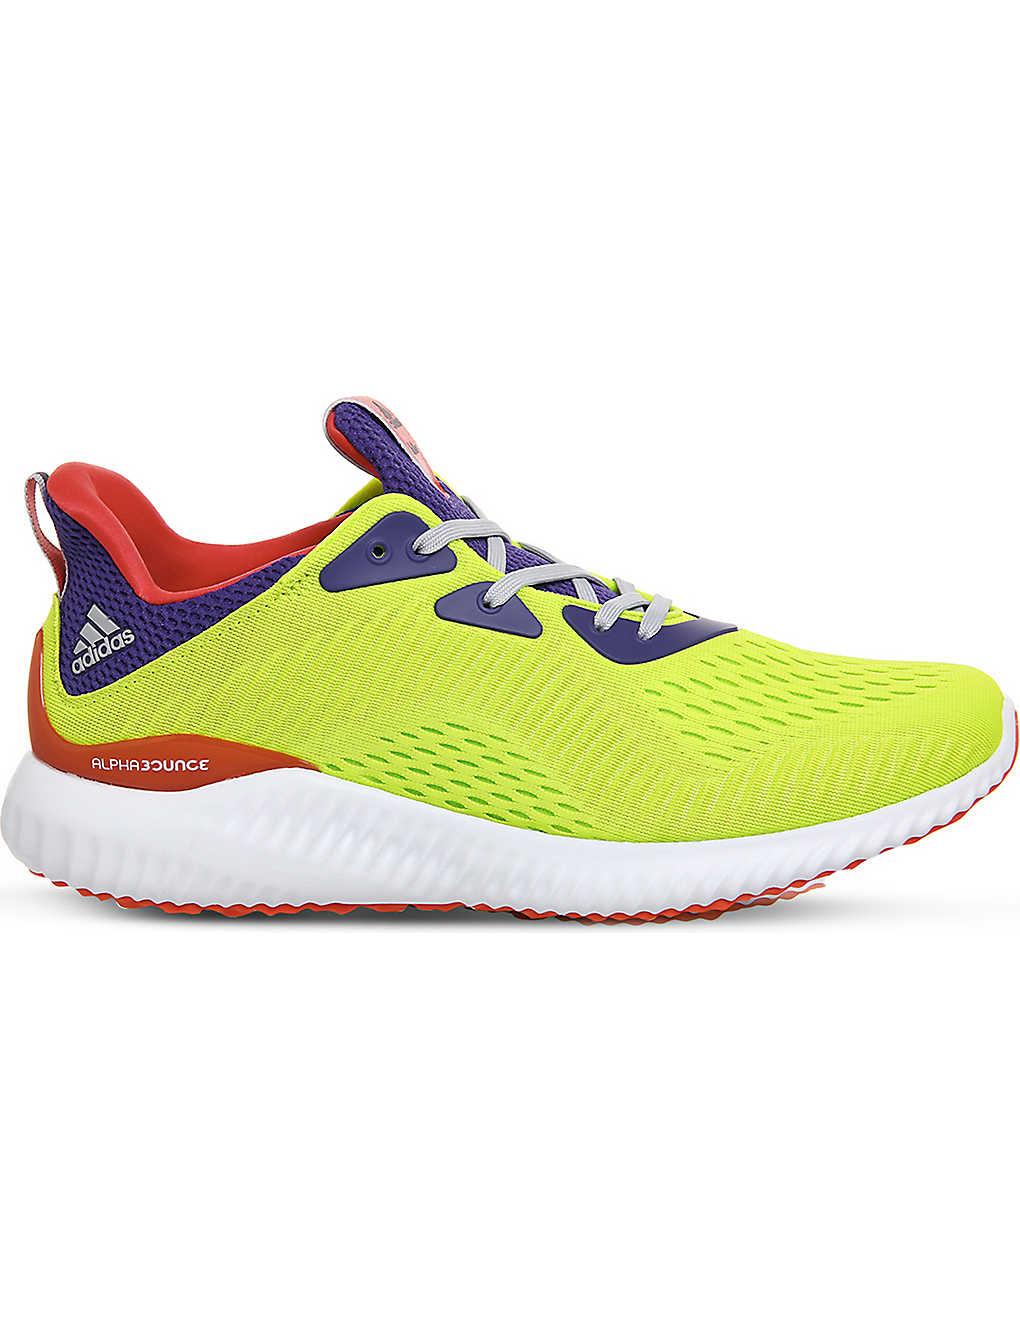 buy online 8f7b3 508c6 ADIDAS - Alphabounce Kolor trainers | Selfridges.com